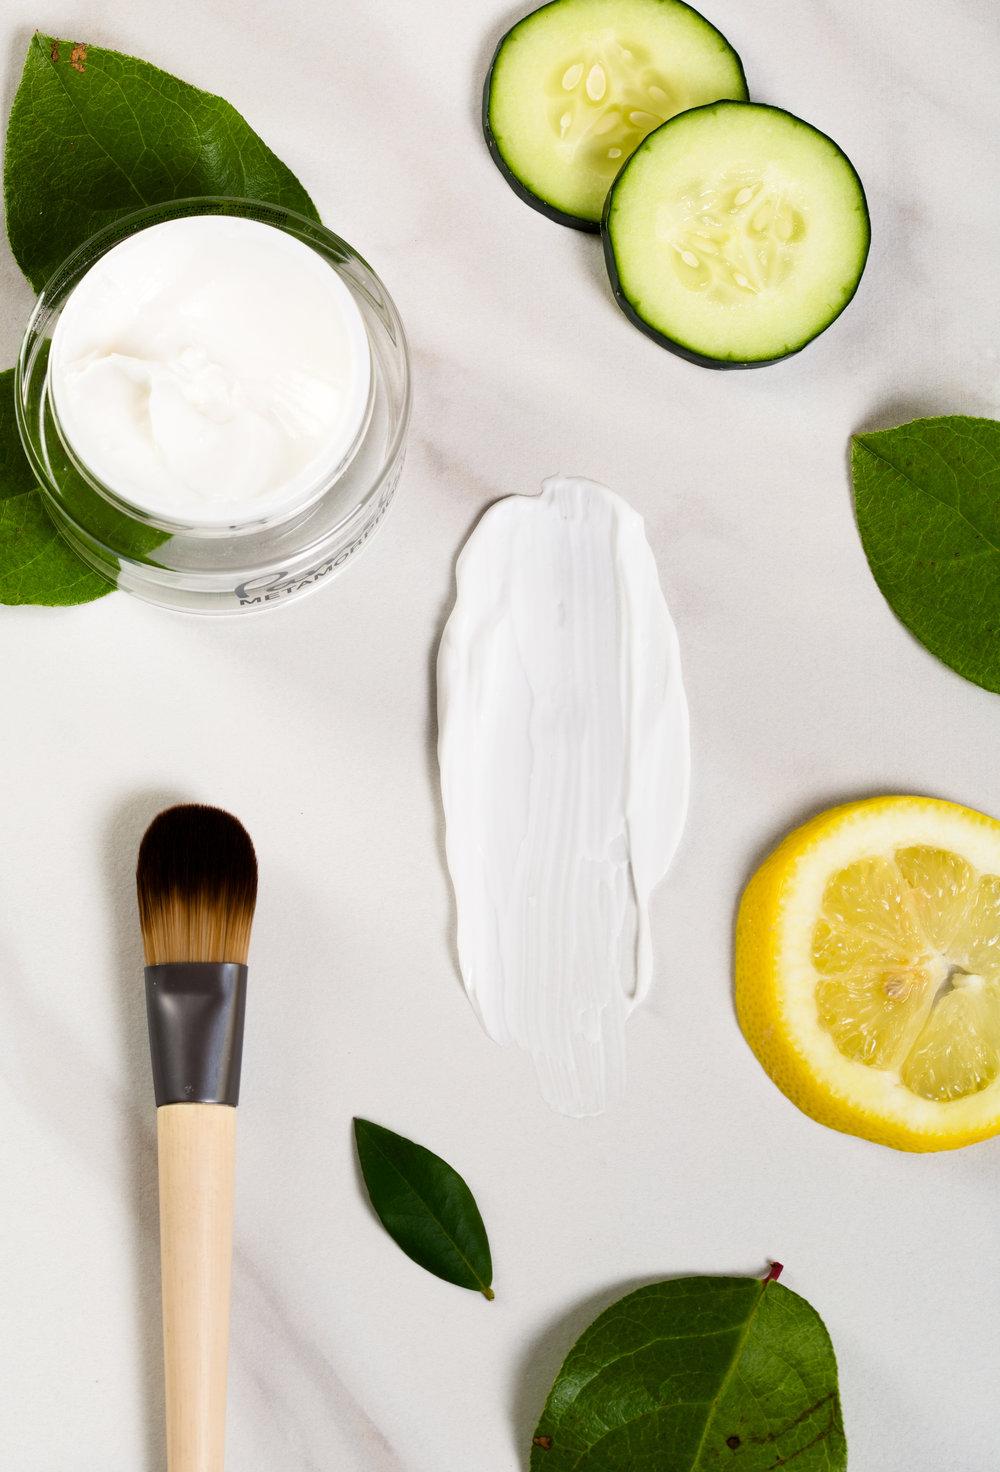 pamela metamorphosis green tea moisturizer